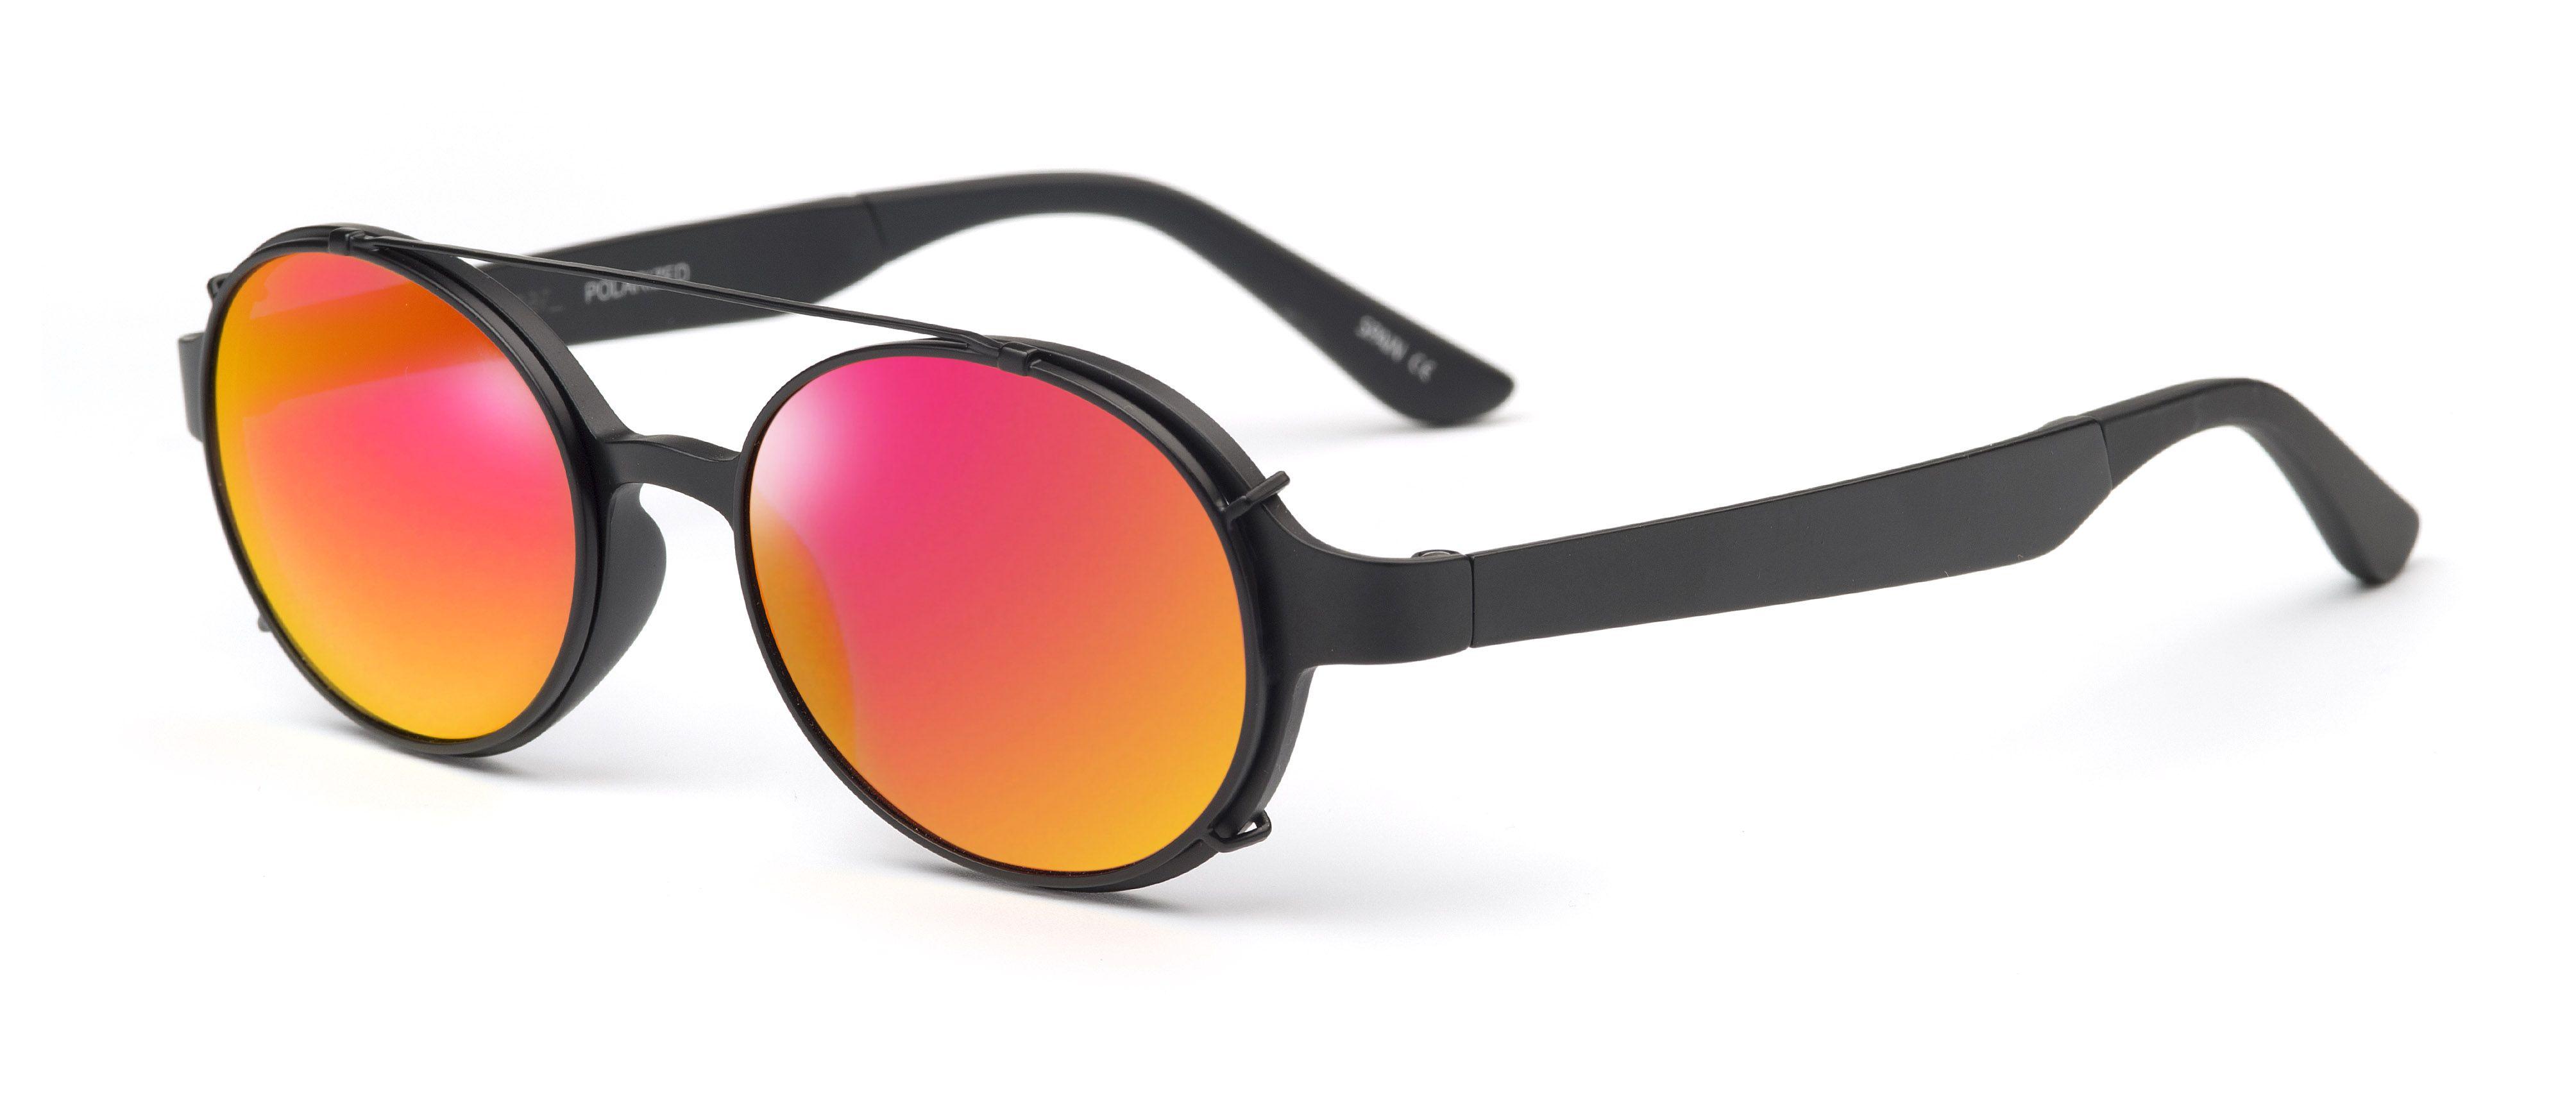 #tendencia #gafasdesol #verano #mujer #trendy #fashion #women #sunglasses #summer